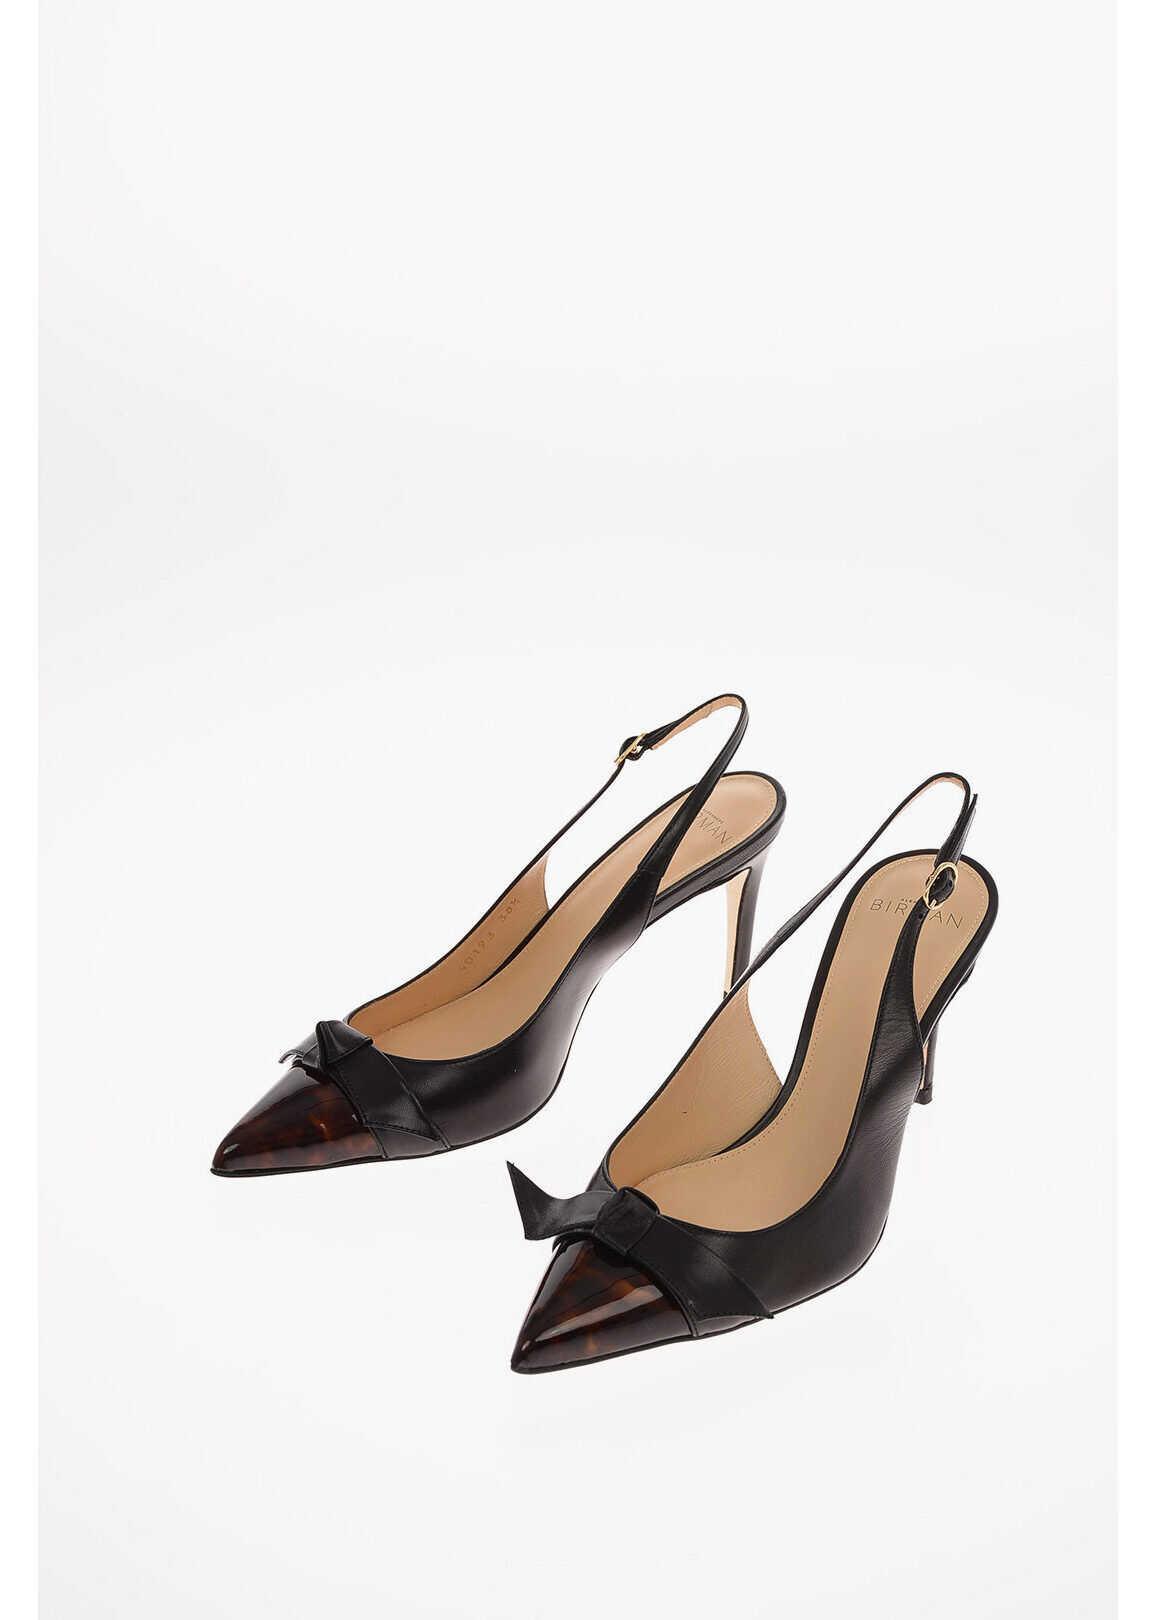 Alexandre Birman 10cm leather PAULA Point Toe Slingback pumps BLACK imagine b-mall.ro